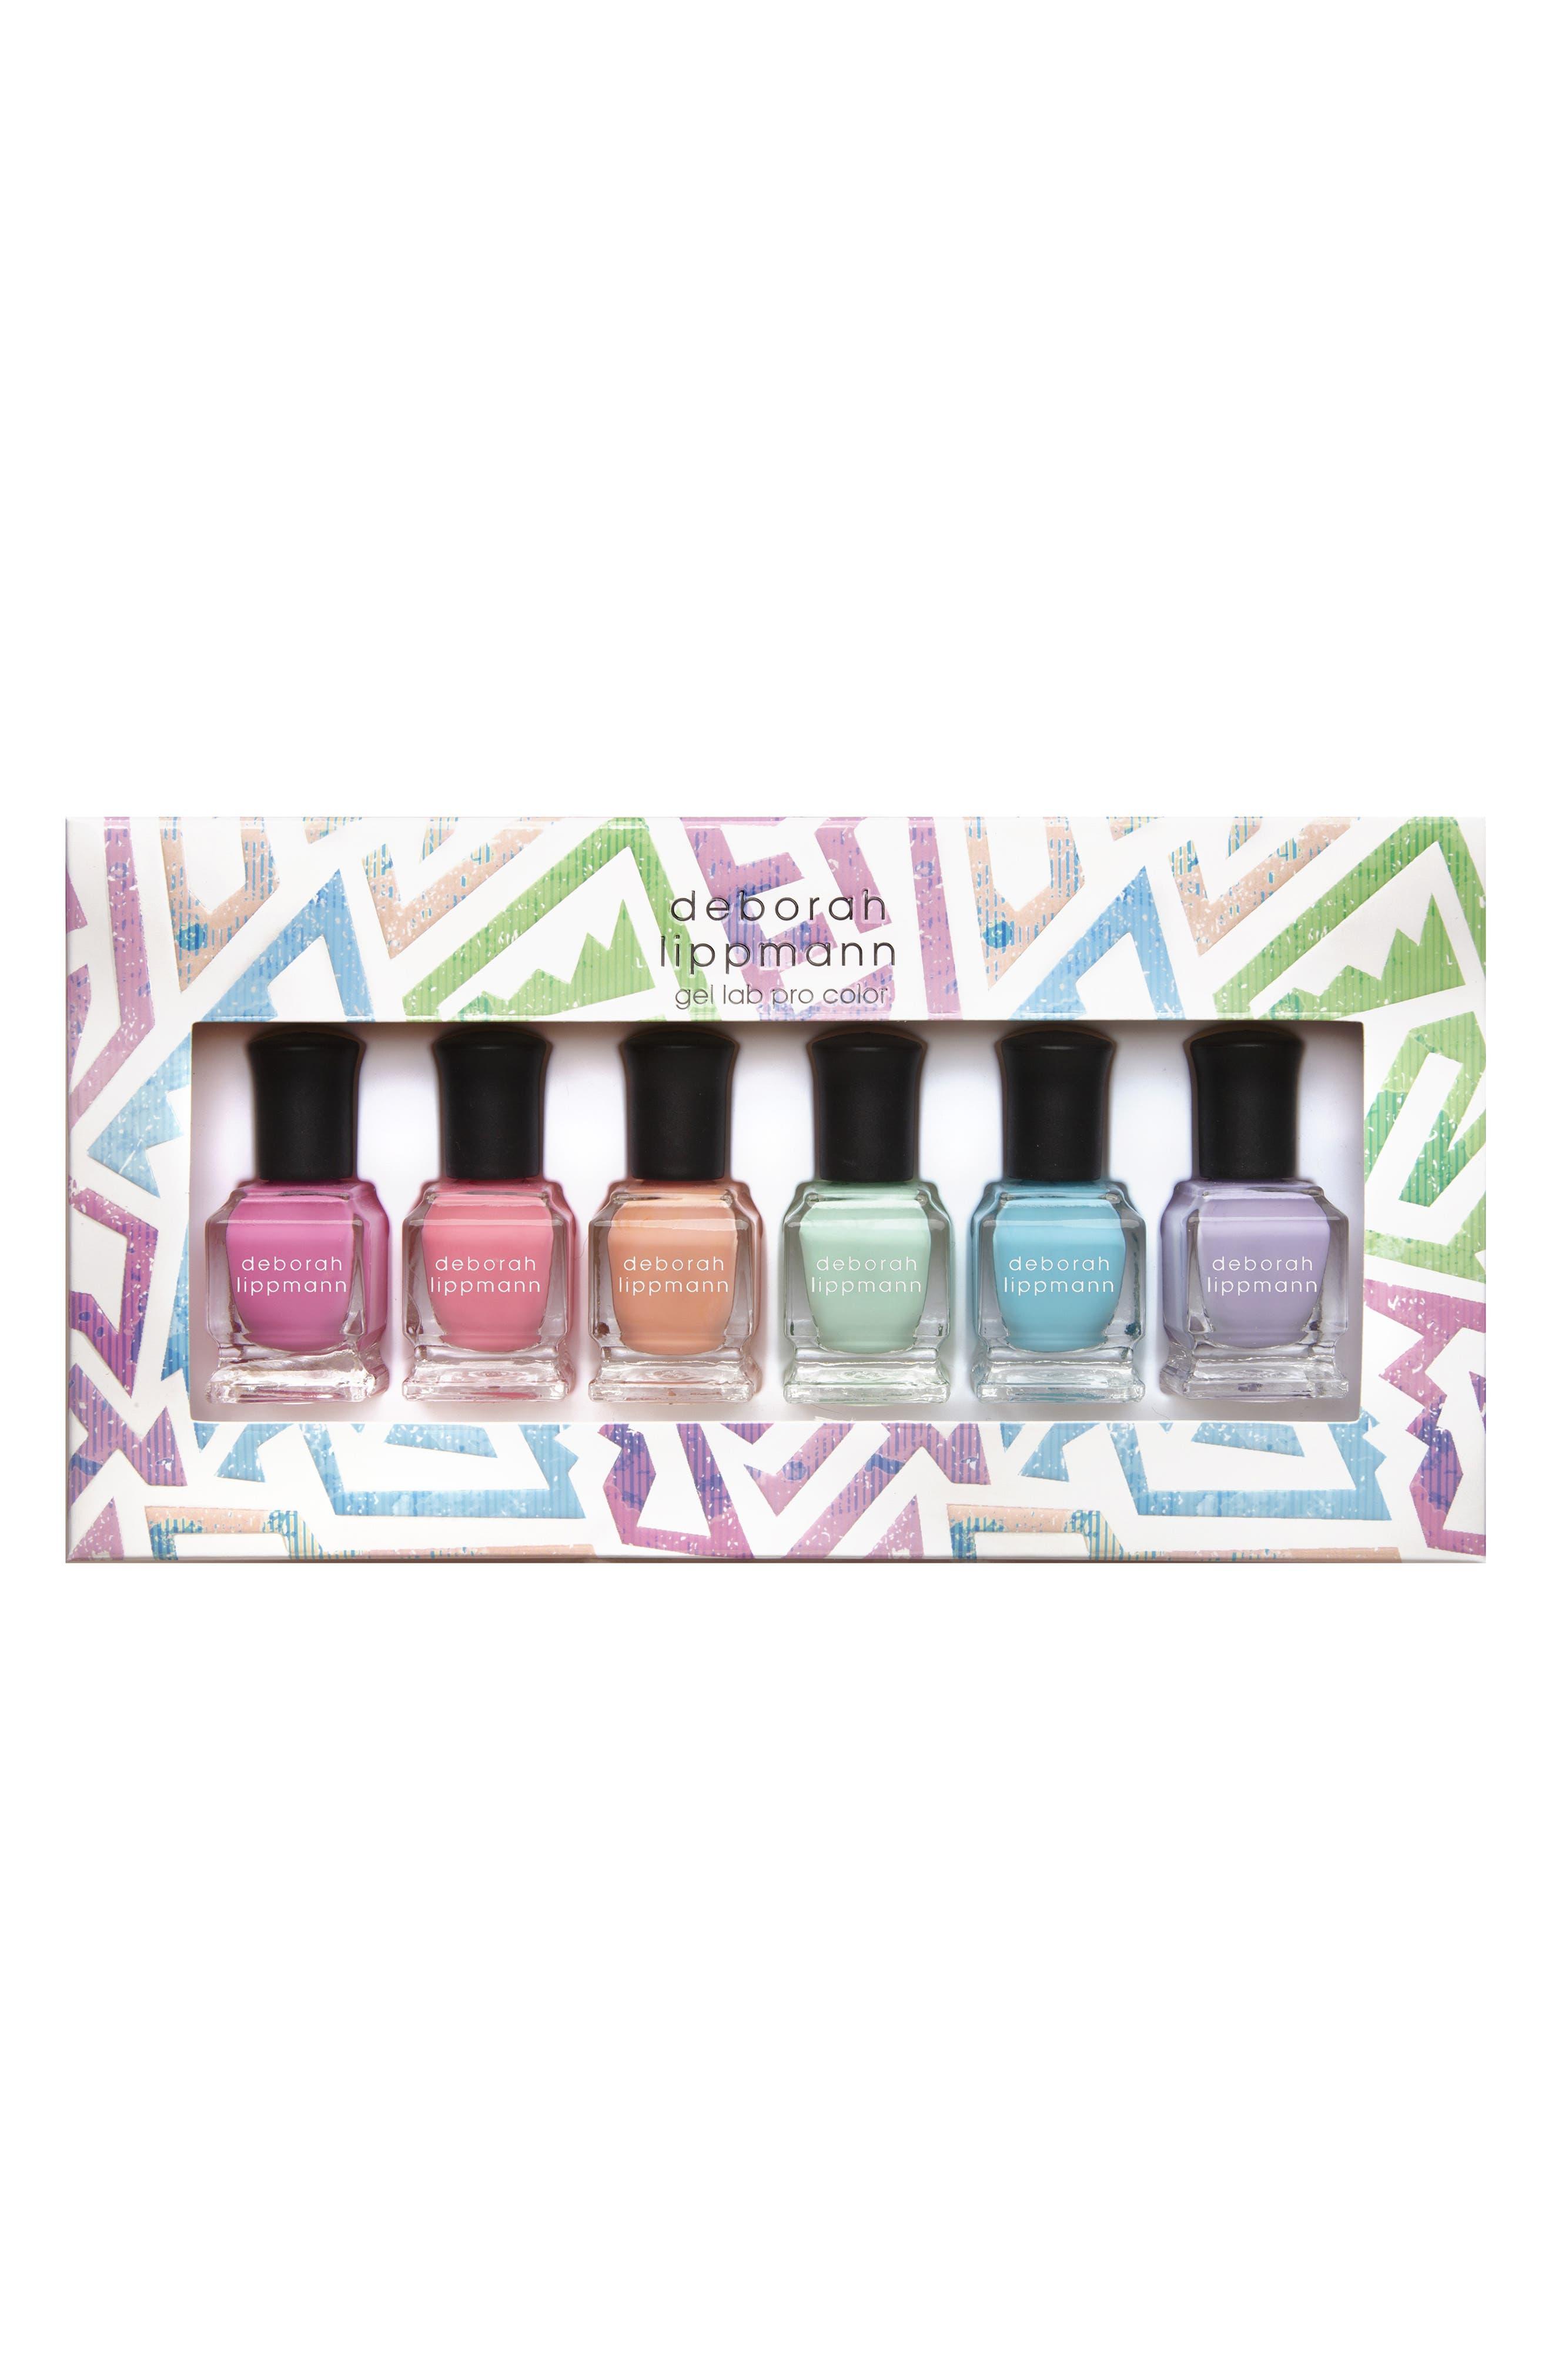 True Colors Gel Lab Pro Nail Polish Set